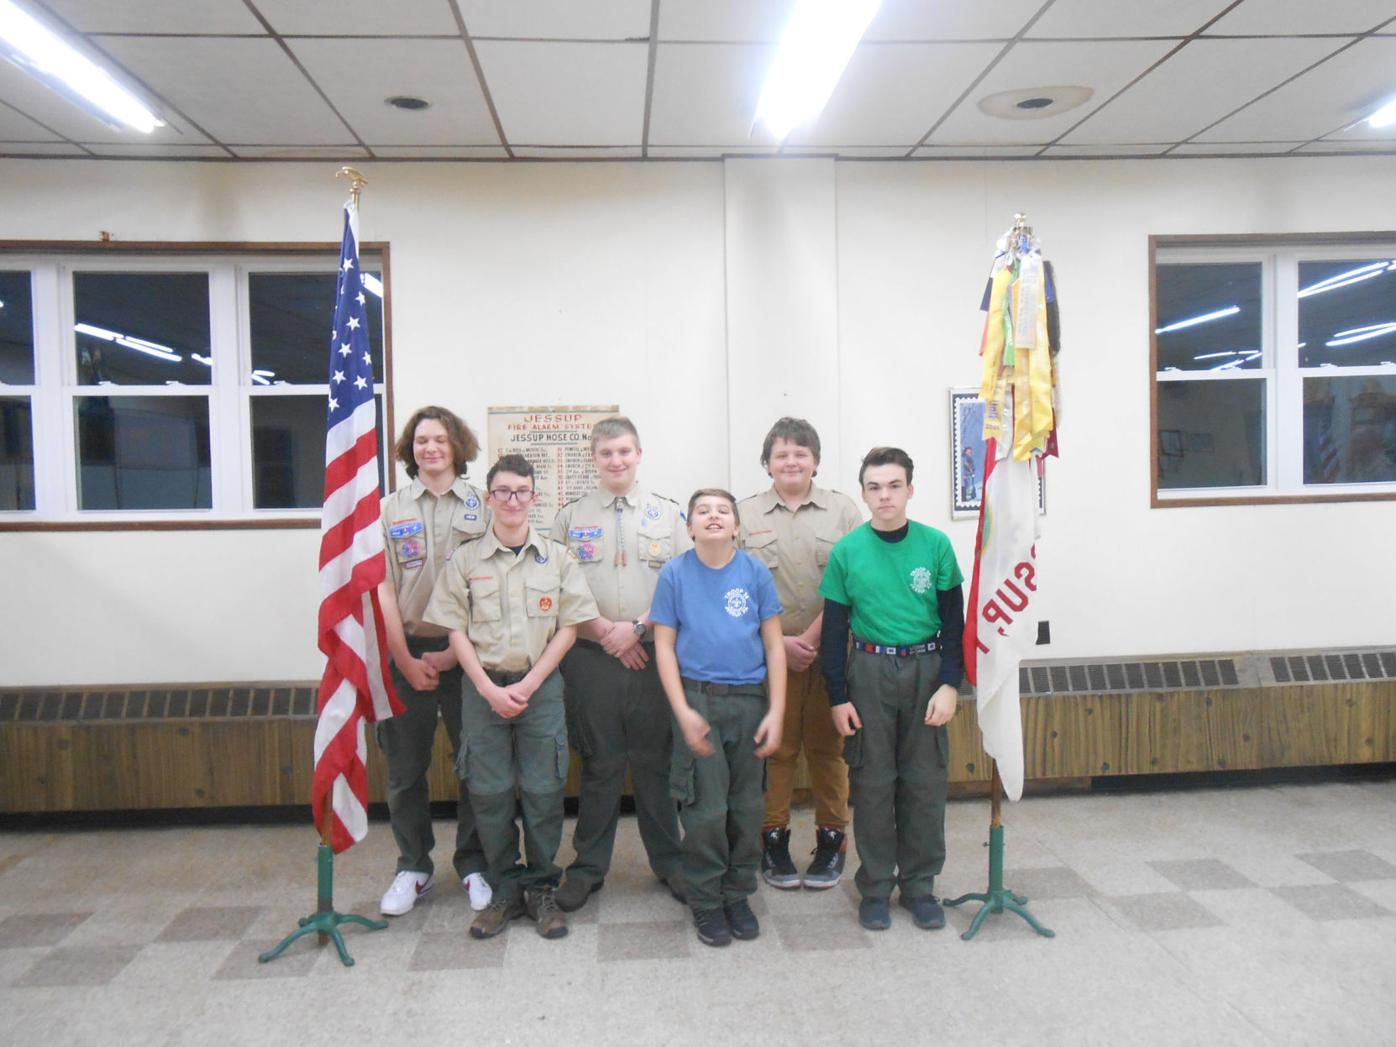 Boy Scouts organize fundraiser